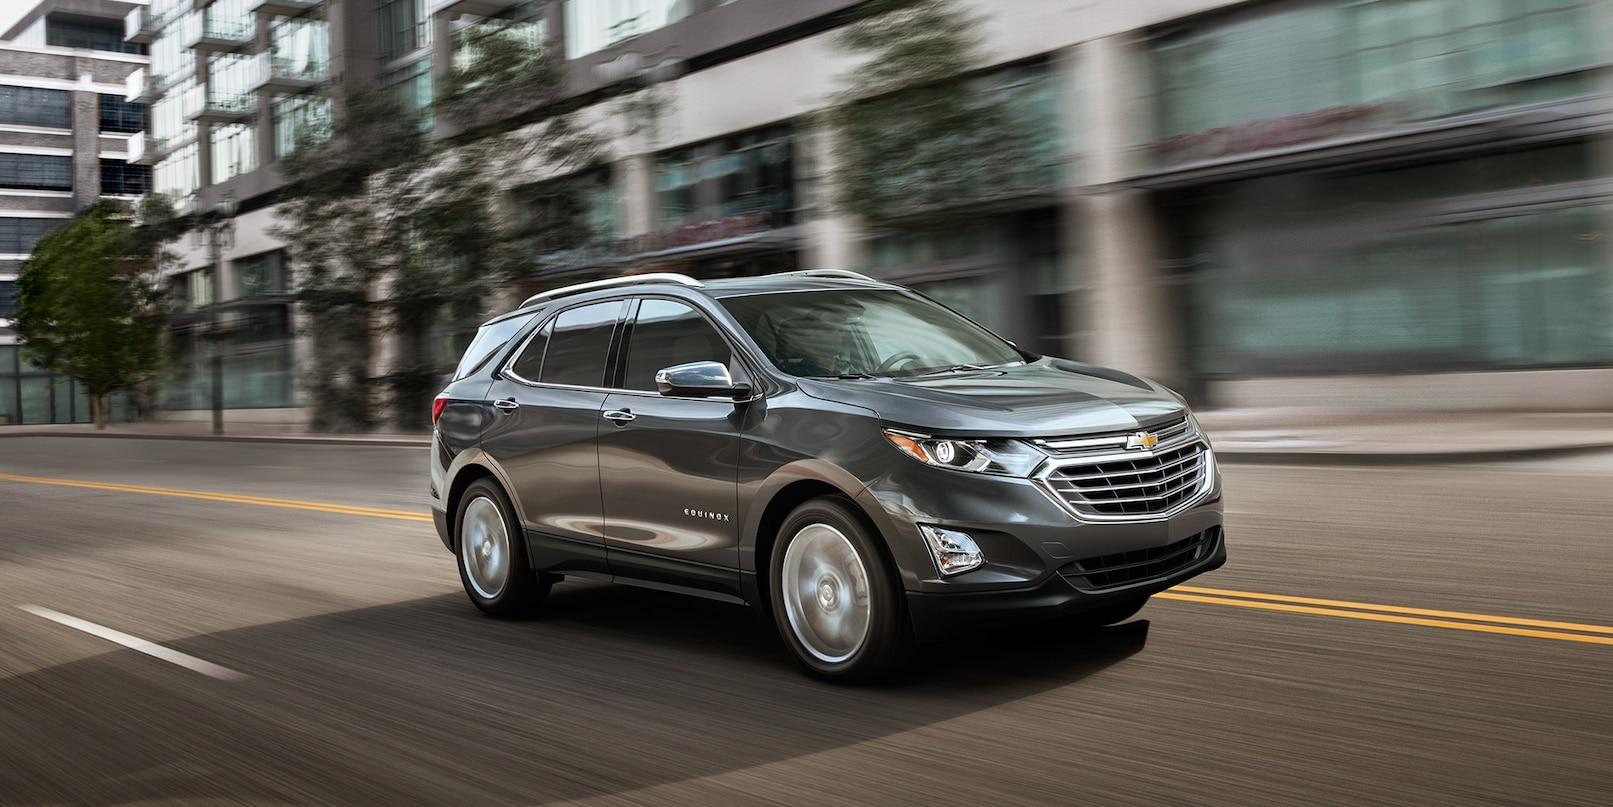 2018 Chevrolet Equinox for Sale near Aberdeen, SD